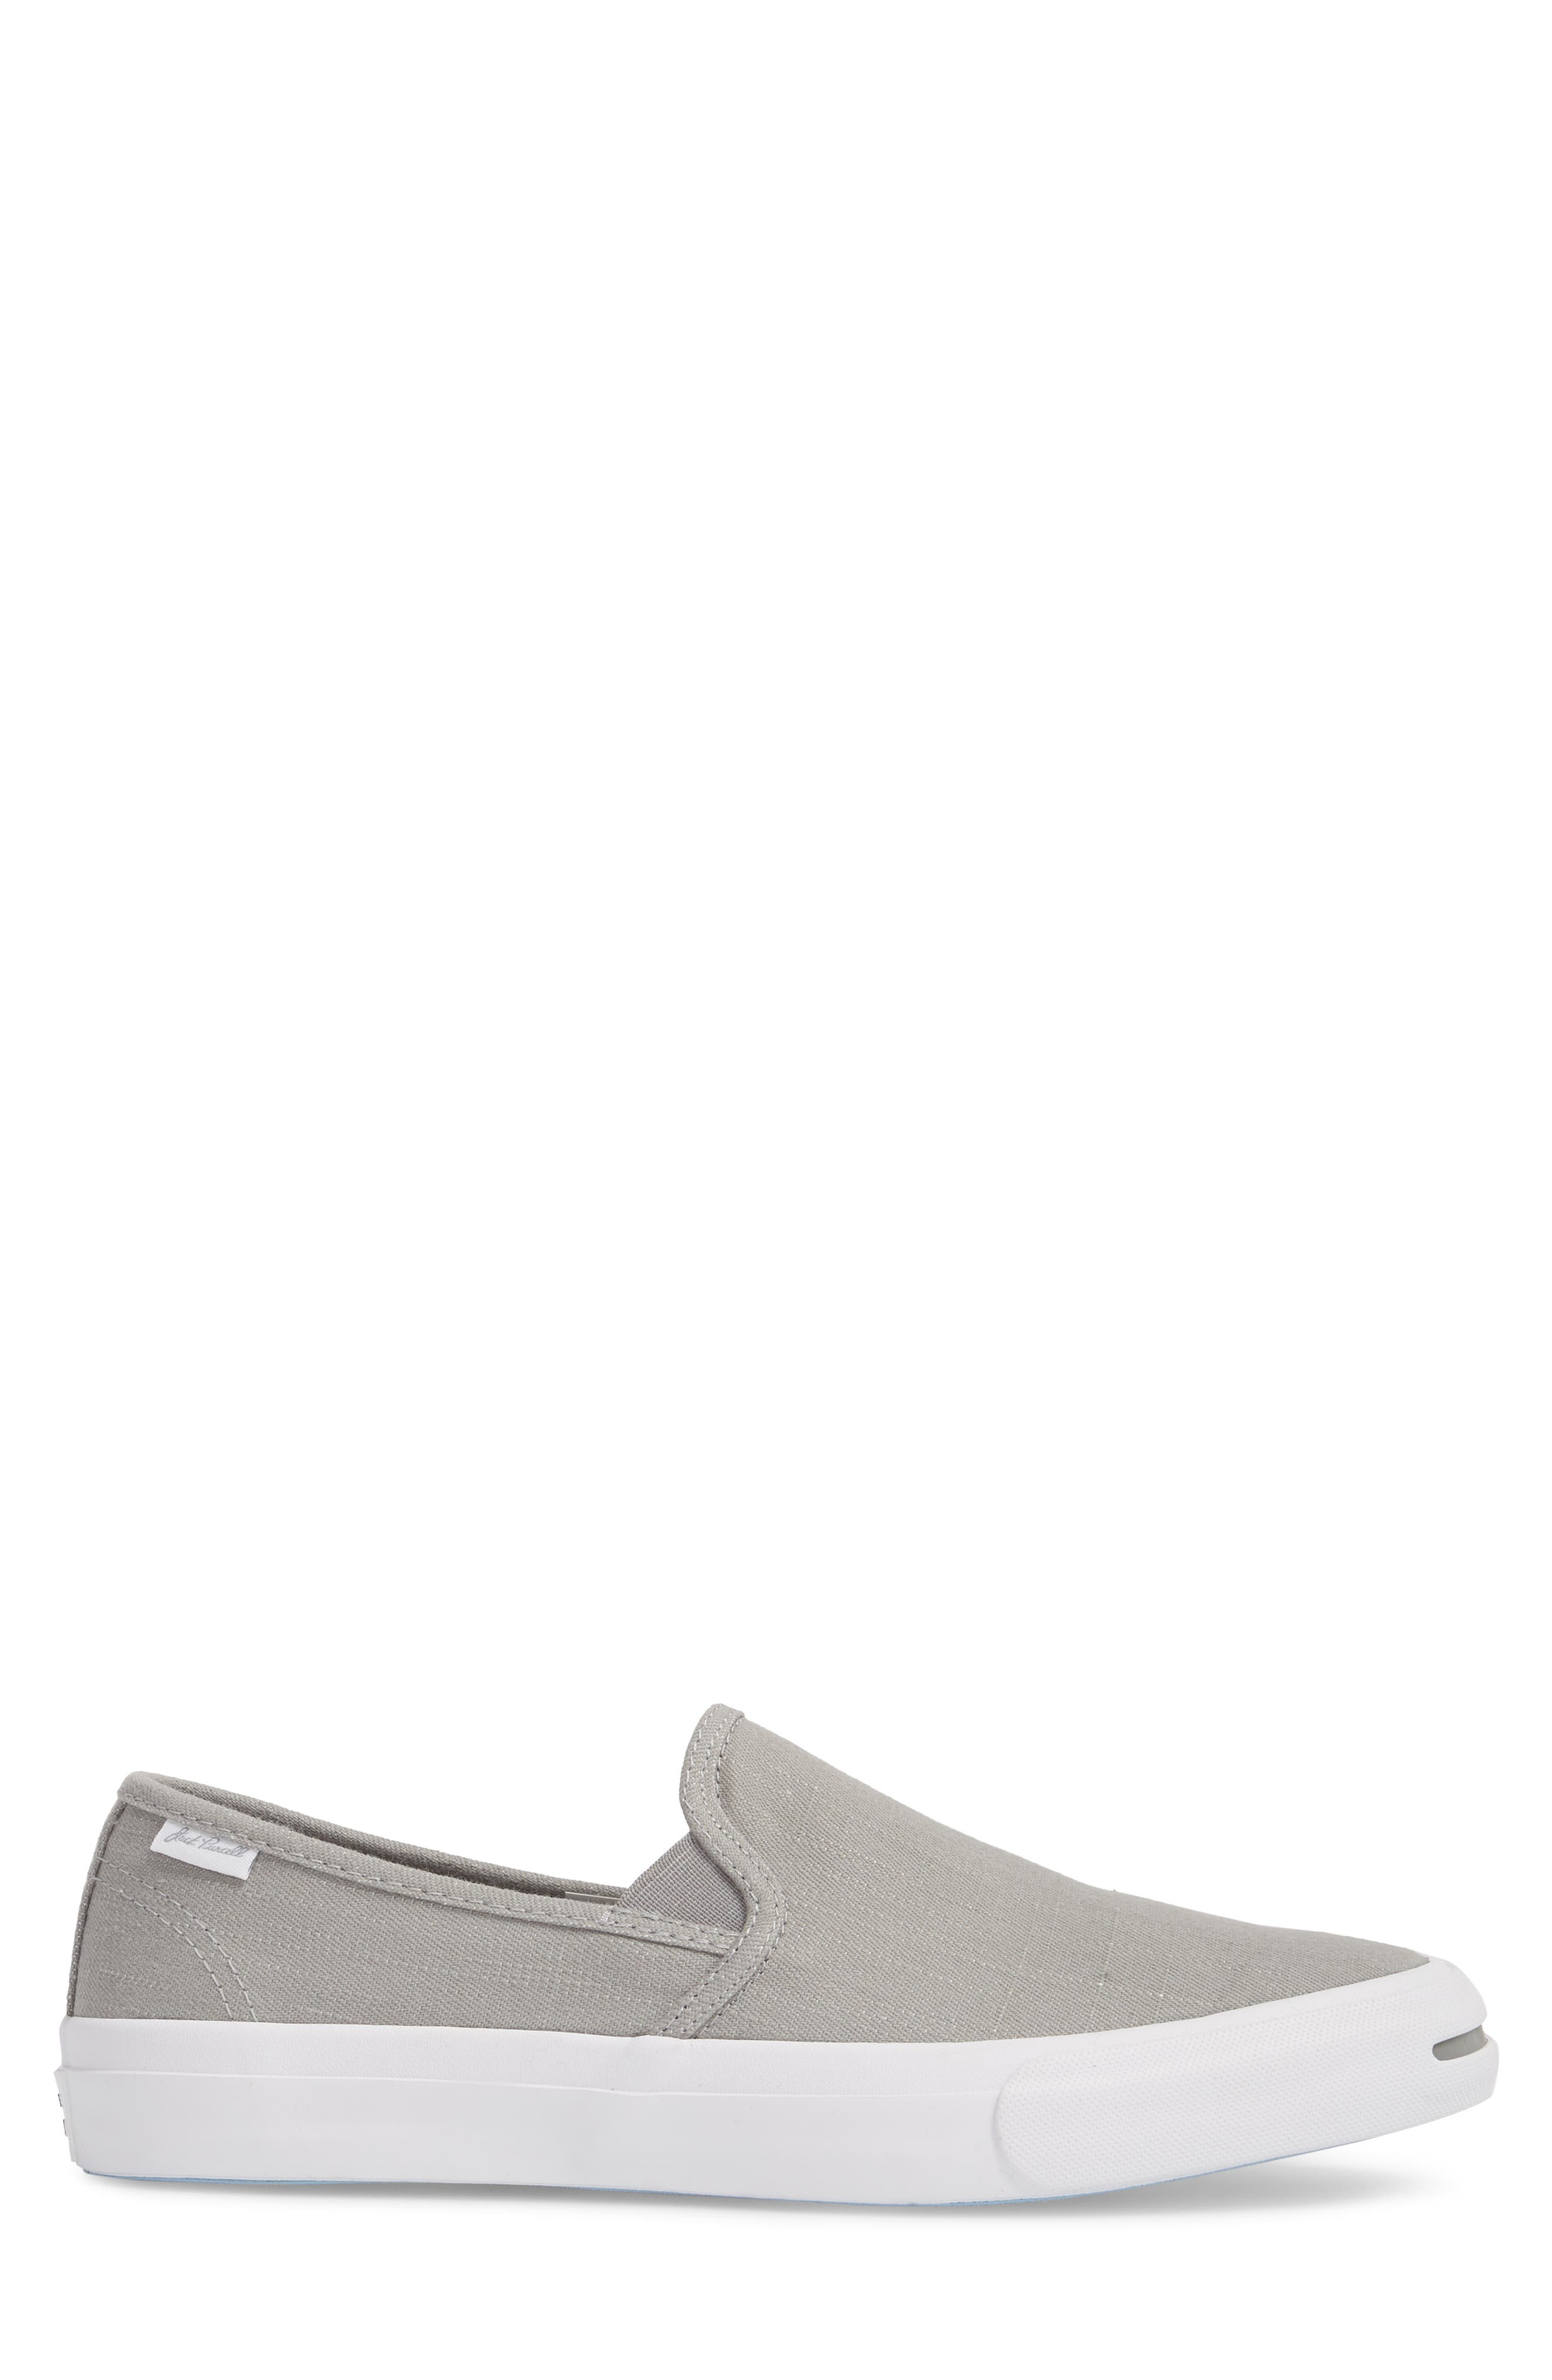 Jack Purcell Low Profile Slip-On Sneaker,                             Alternate thumbnail 3, color,                             020